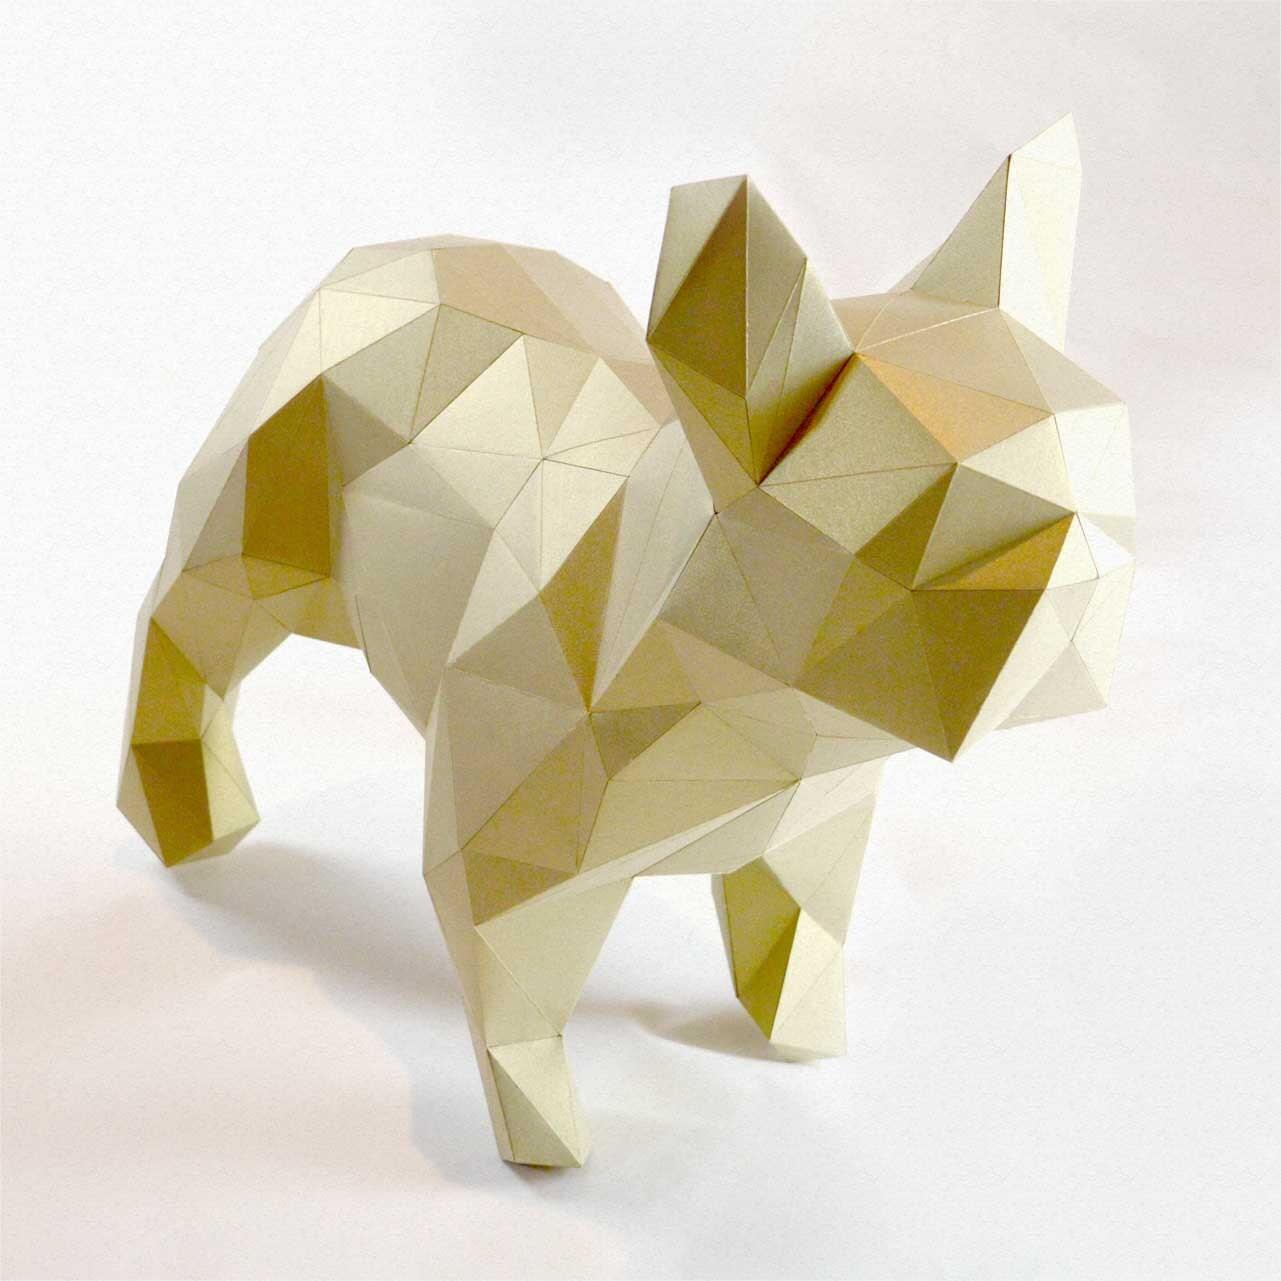 Dogo DIY folding kit for a beautiful geometric low poly